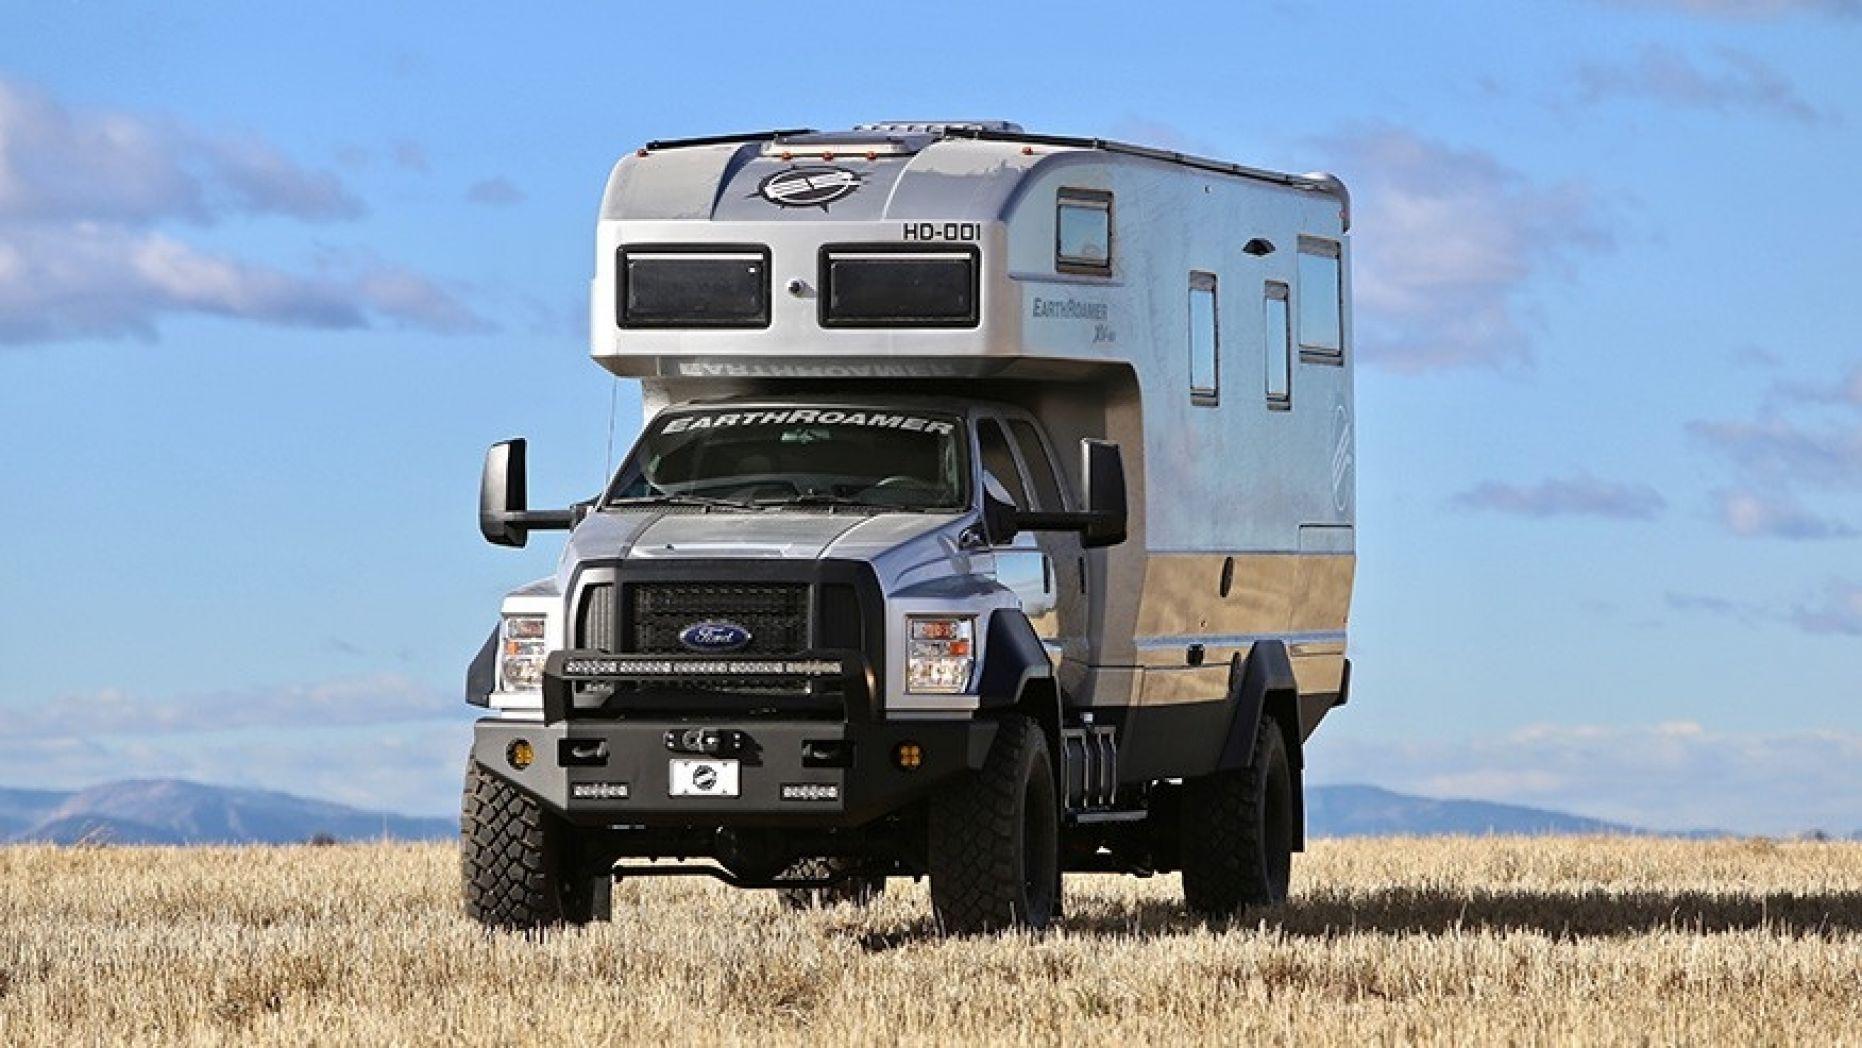 EarthRoamer XV-HD is a $1.5 million-dollar monster RV